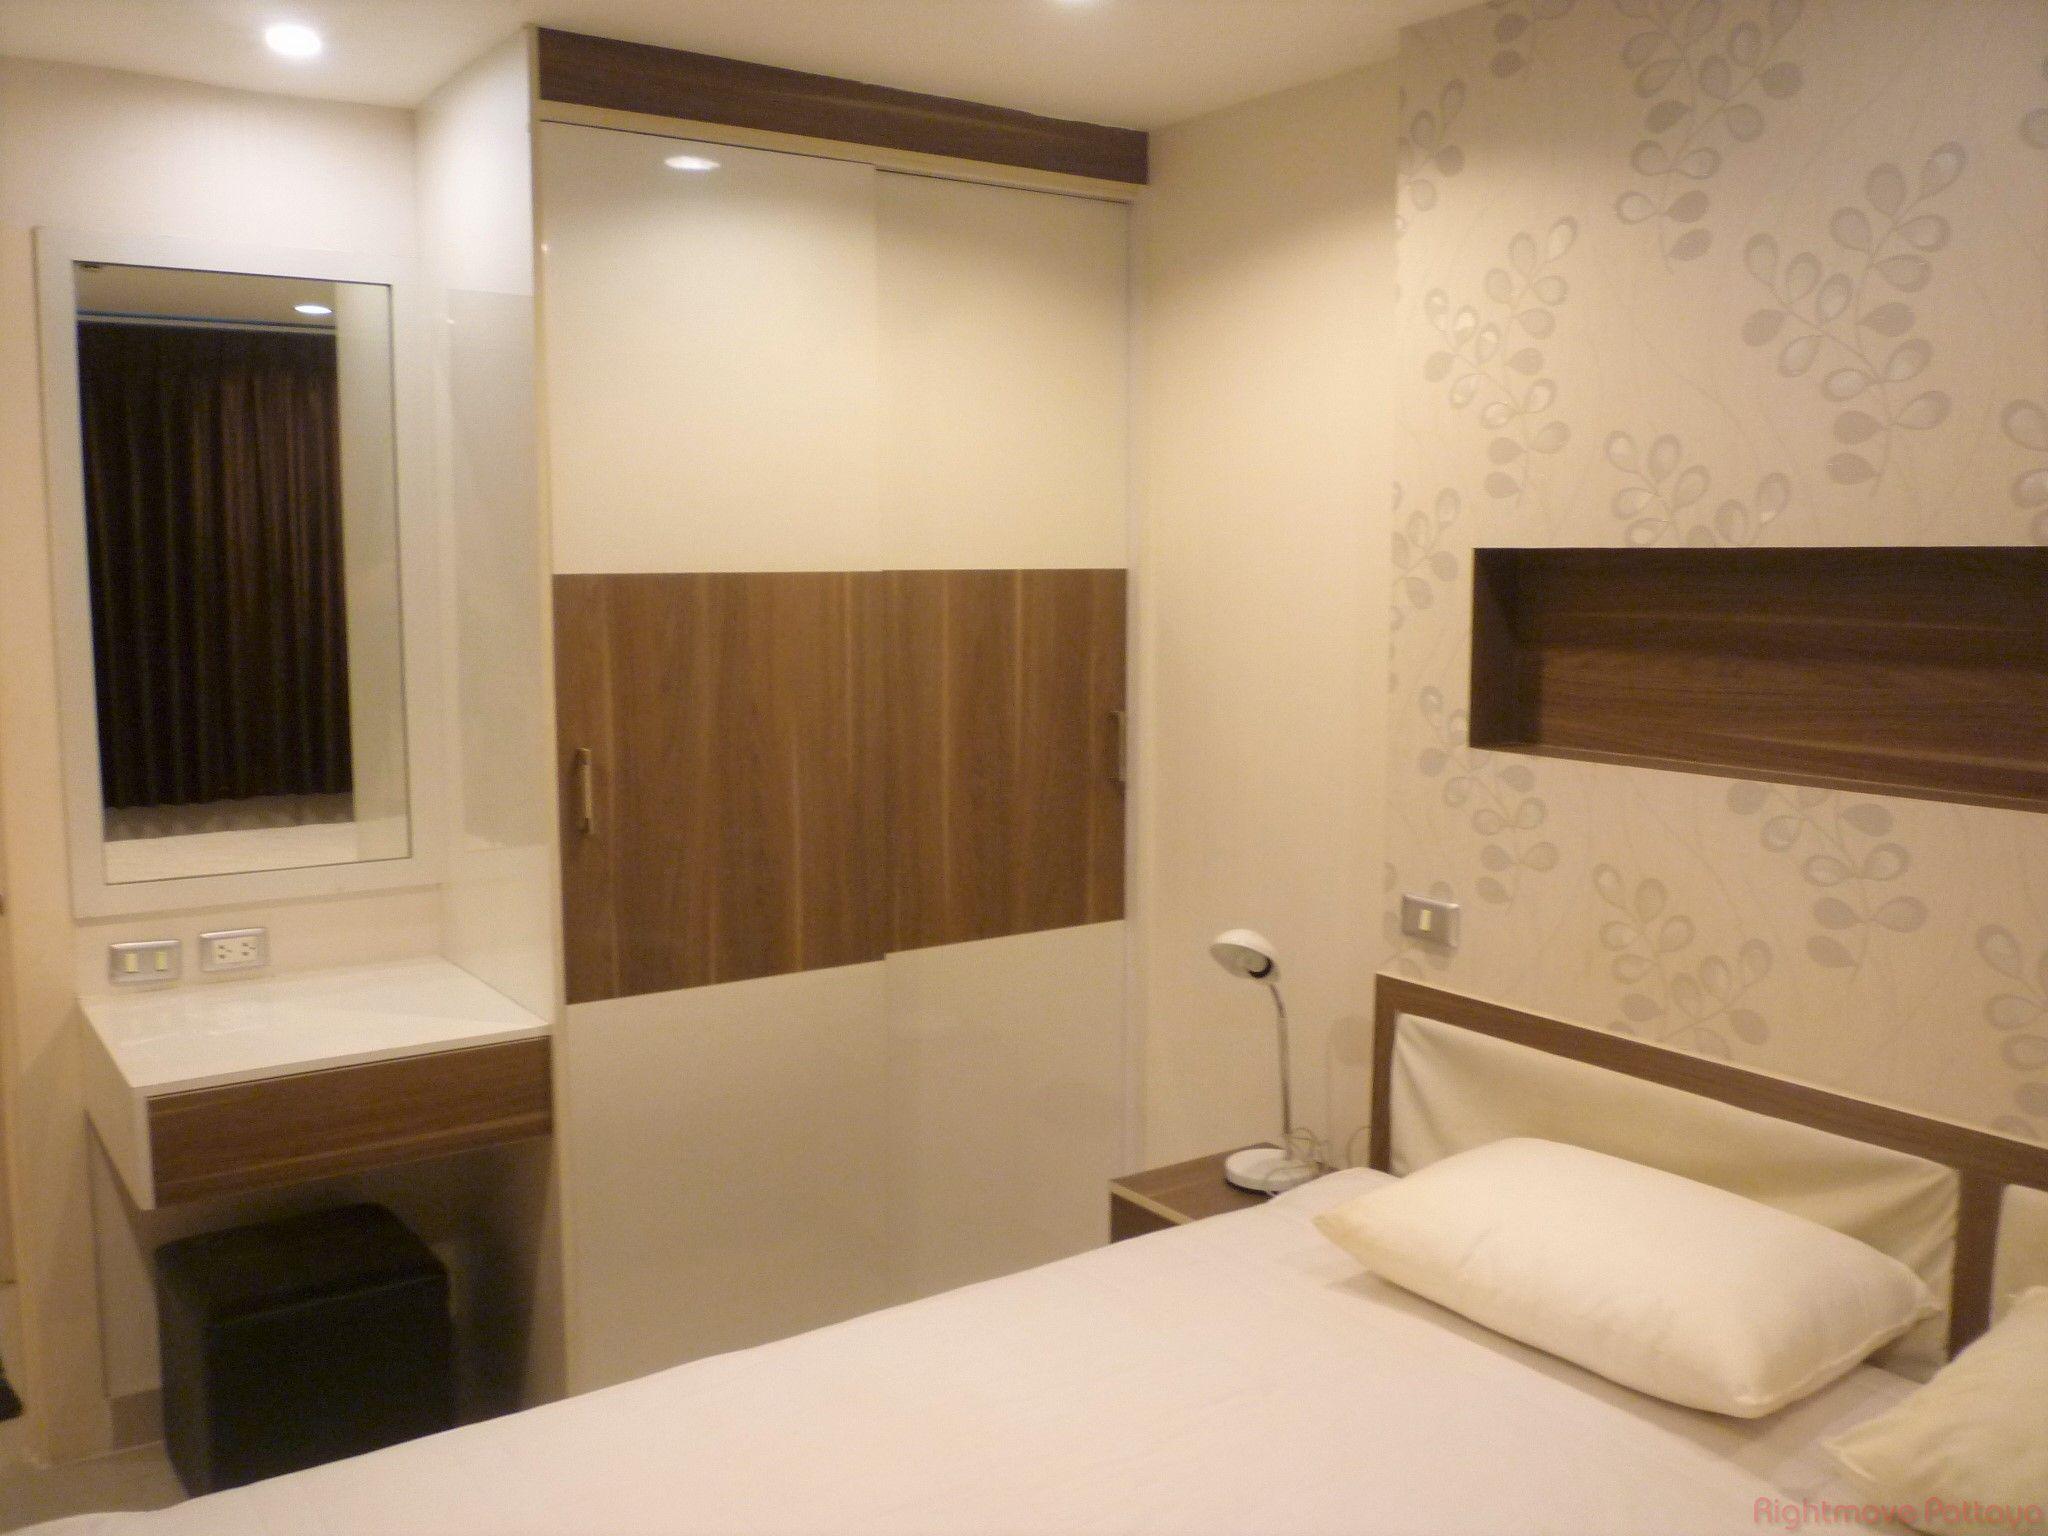 pic-9-Rightmove Pattaya Porchland 2 Jomtien Resort Condominiums for sale in Jomtien Pattaya